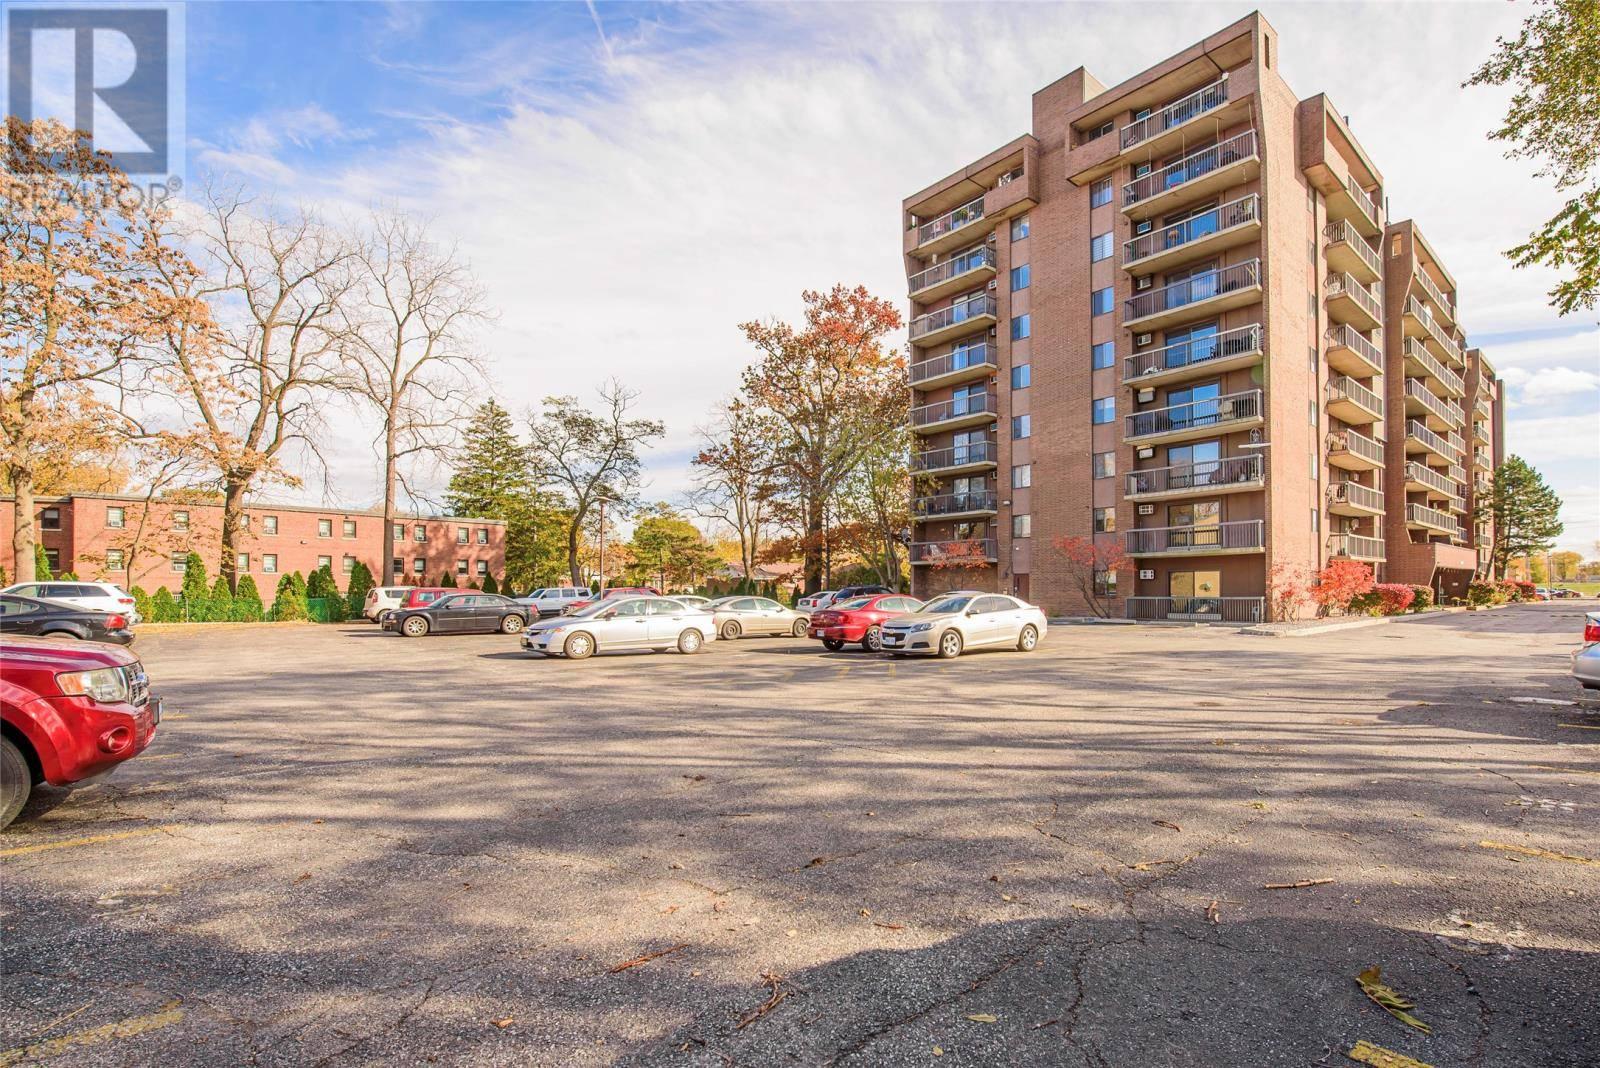 413 - 3936 Wyandotte Street East, Windsor | Image 2